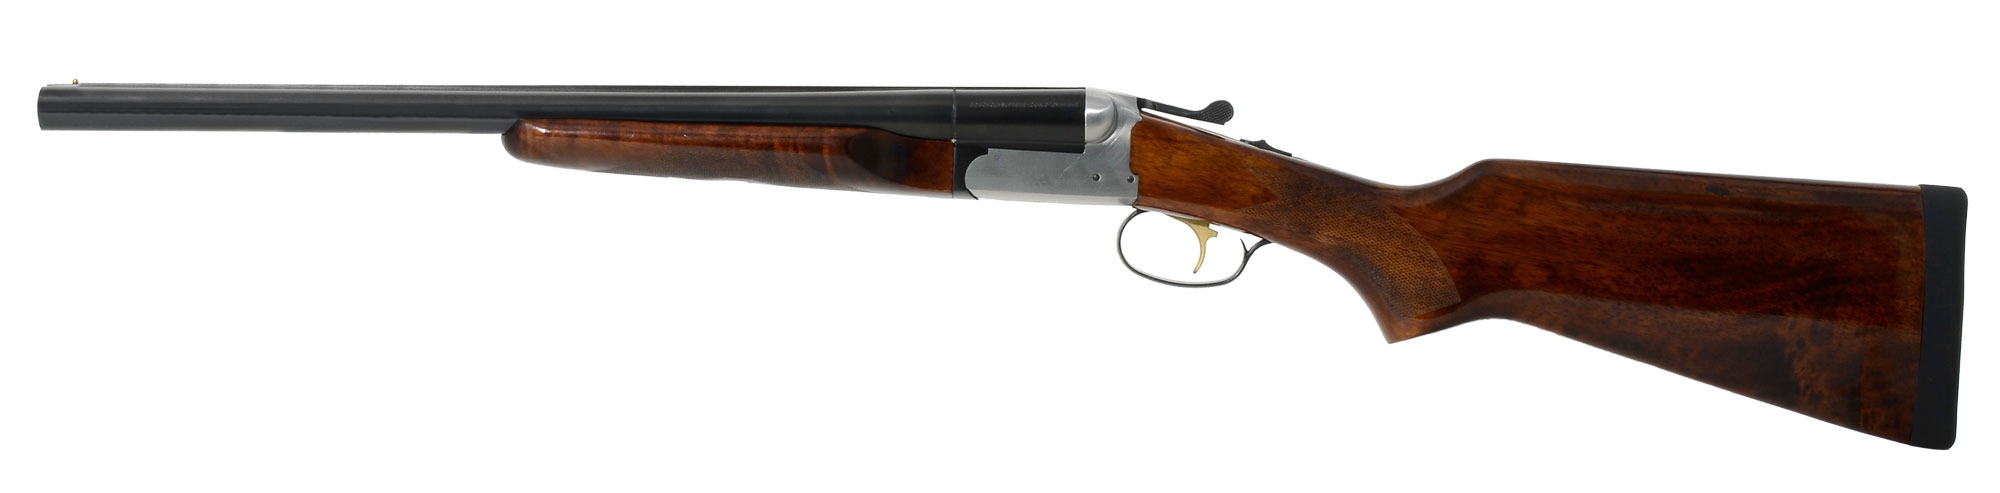 Stoeger 31463 Coach Gun Supreme 12ga Shotgun